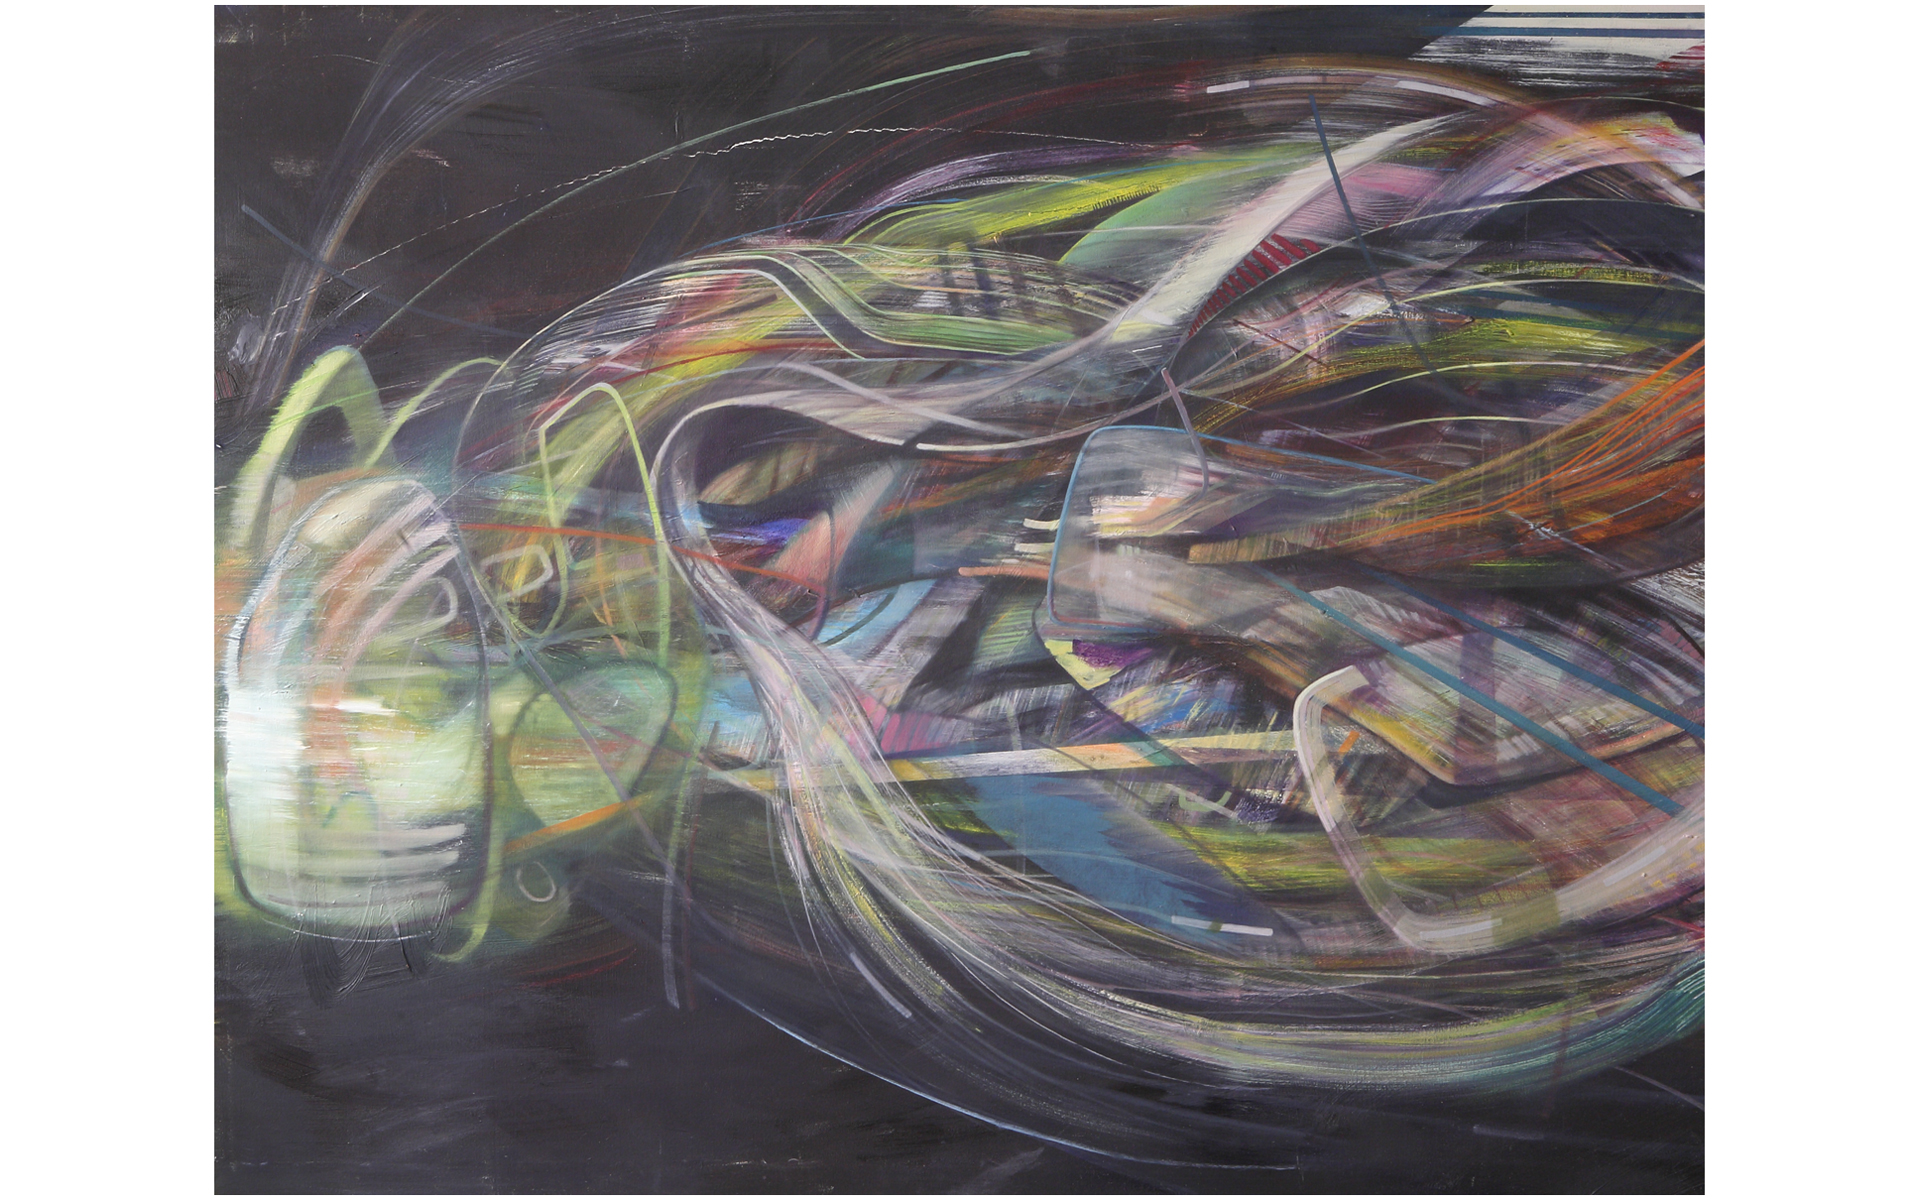 Sleeper, painting by Dipesh Parmar